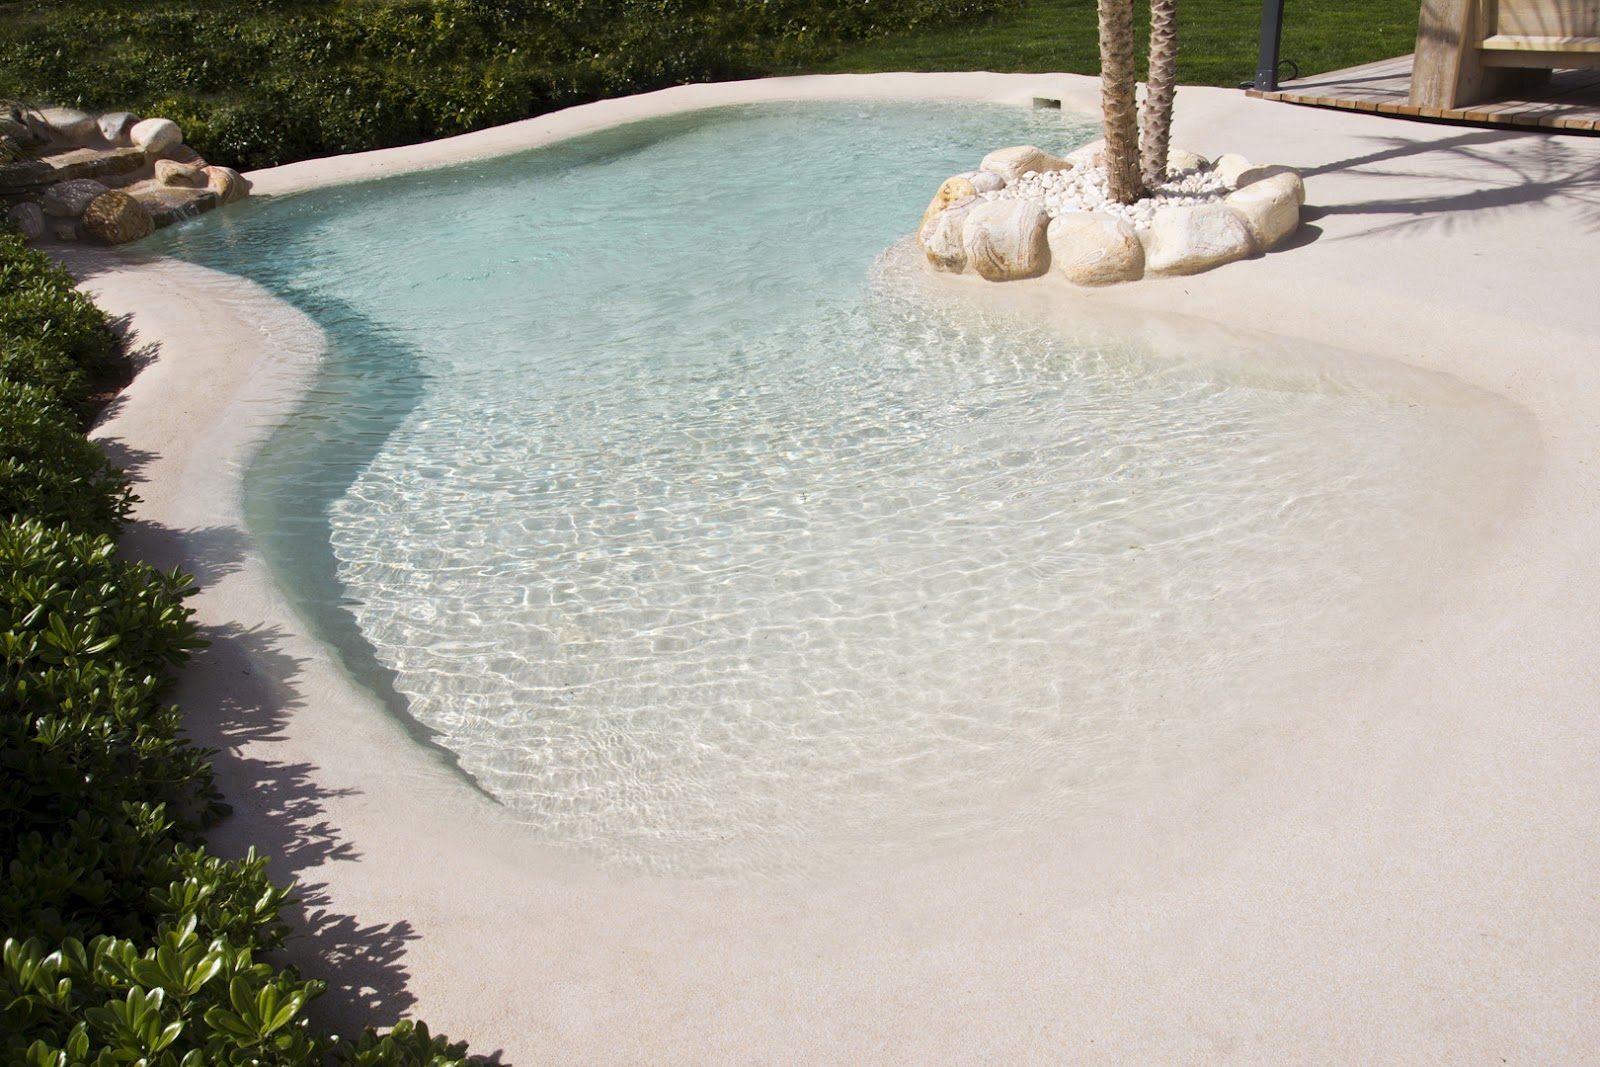 piscinas de arena piscigar 02